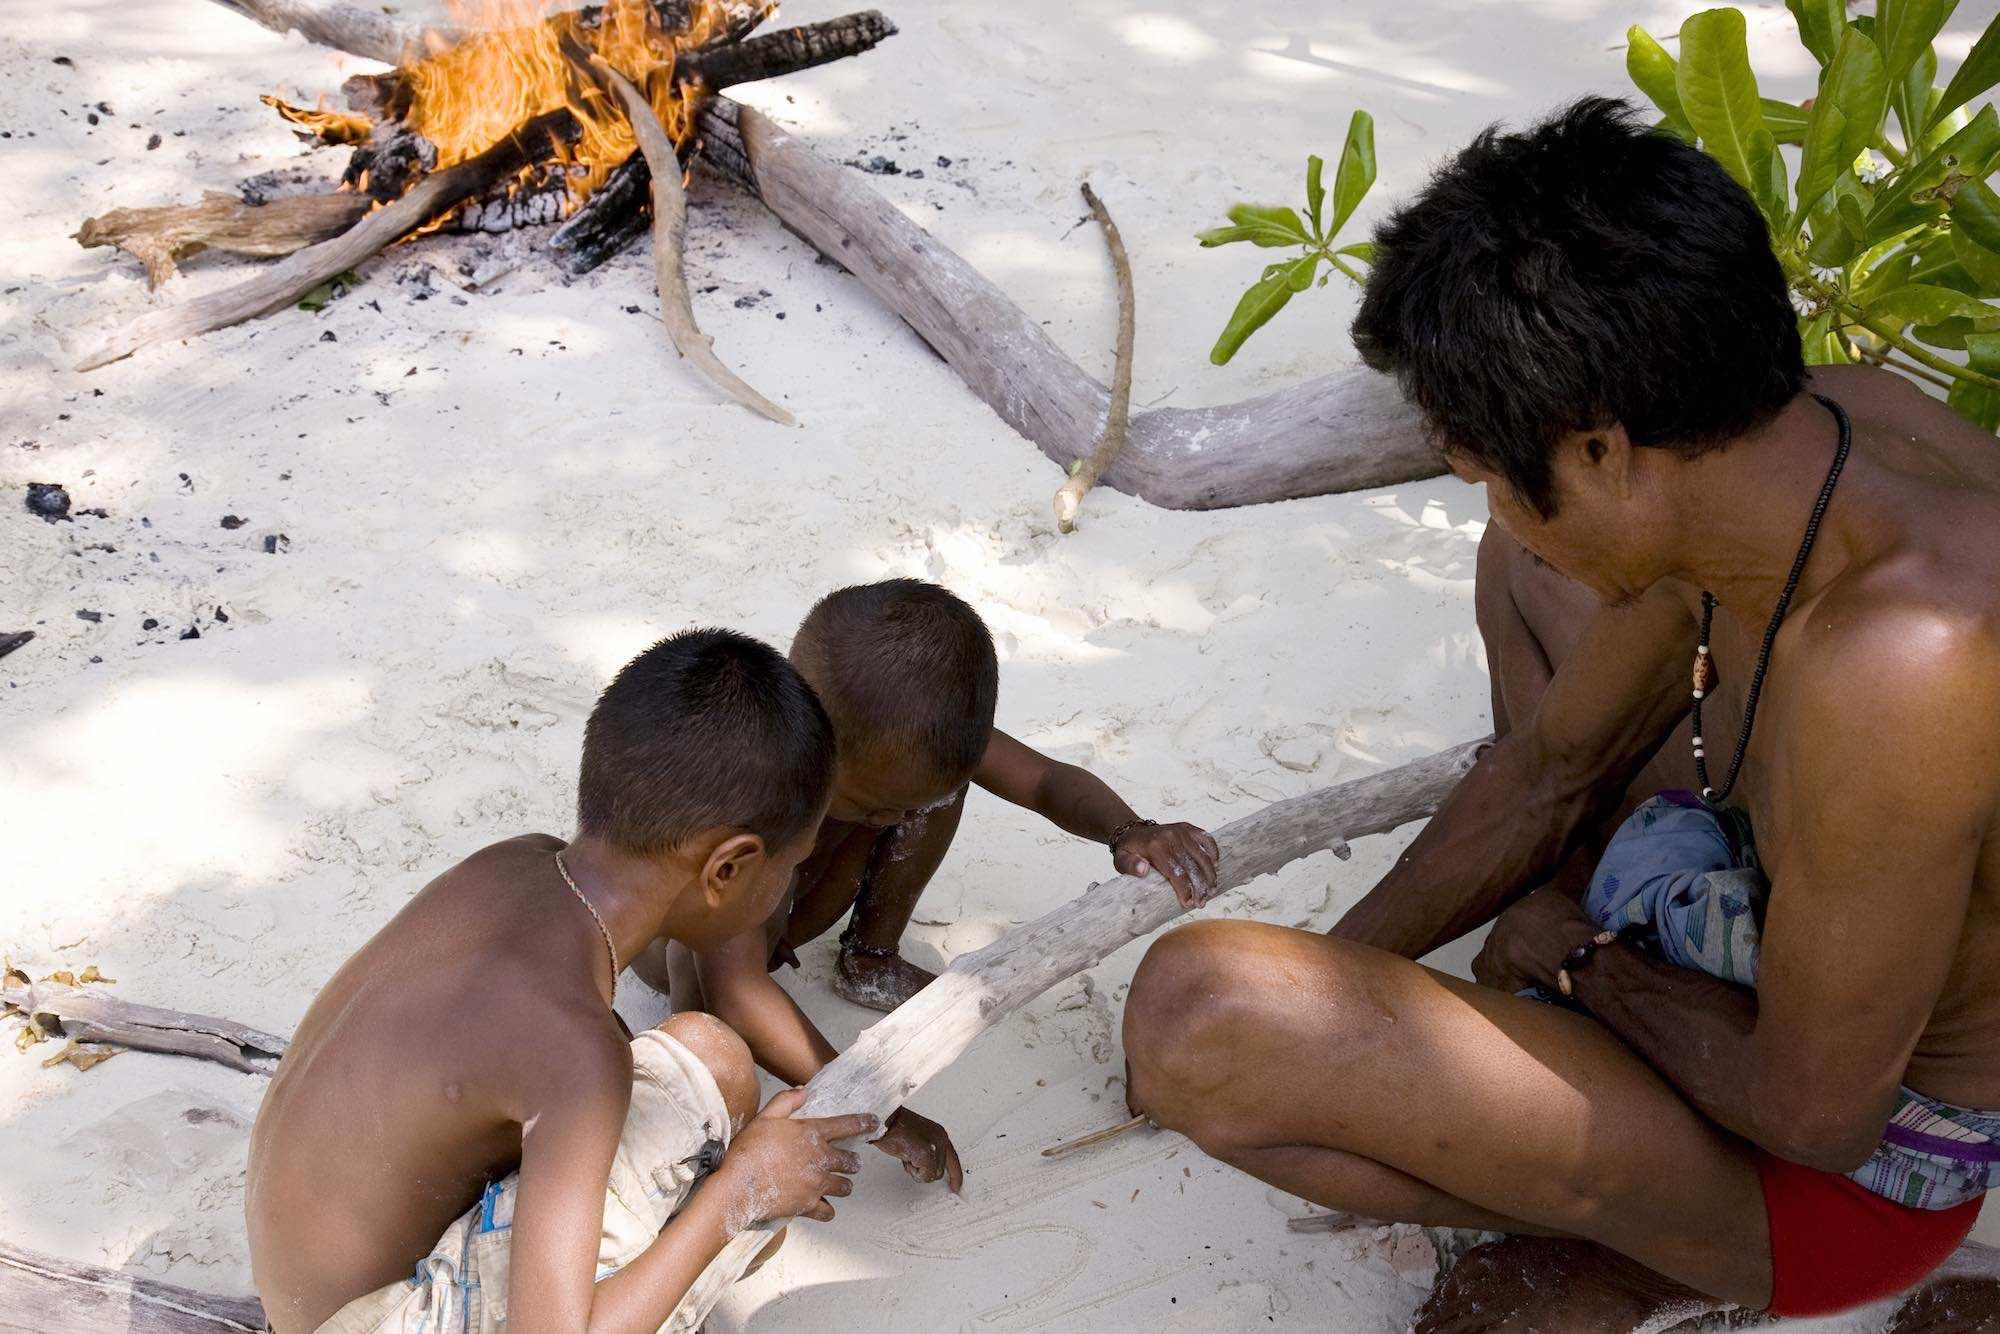 17.Tat drafting illiustrations in the sand - teaching his boys Moken life skills.jpeg